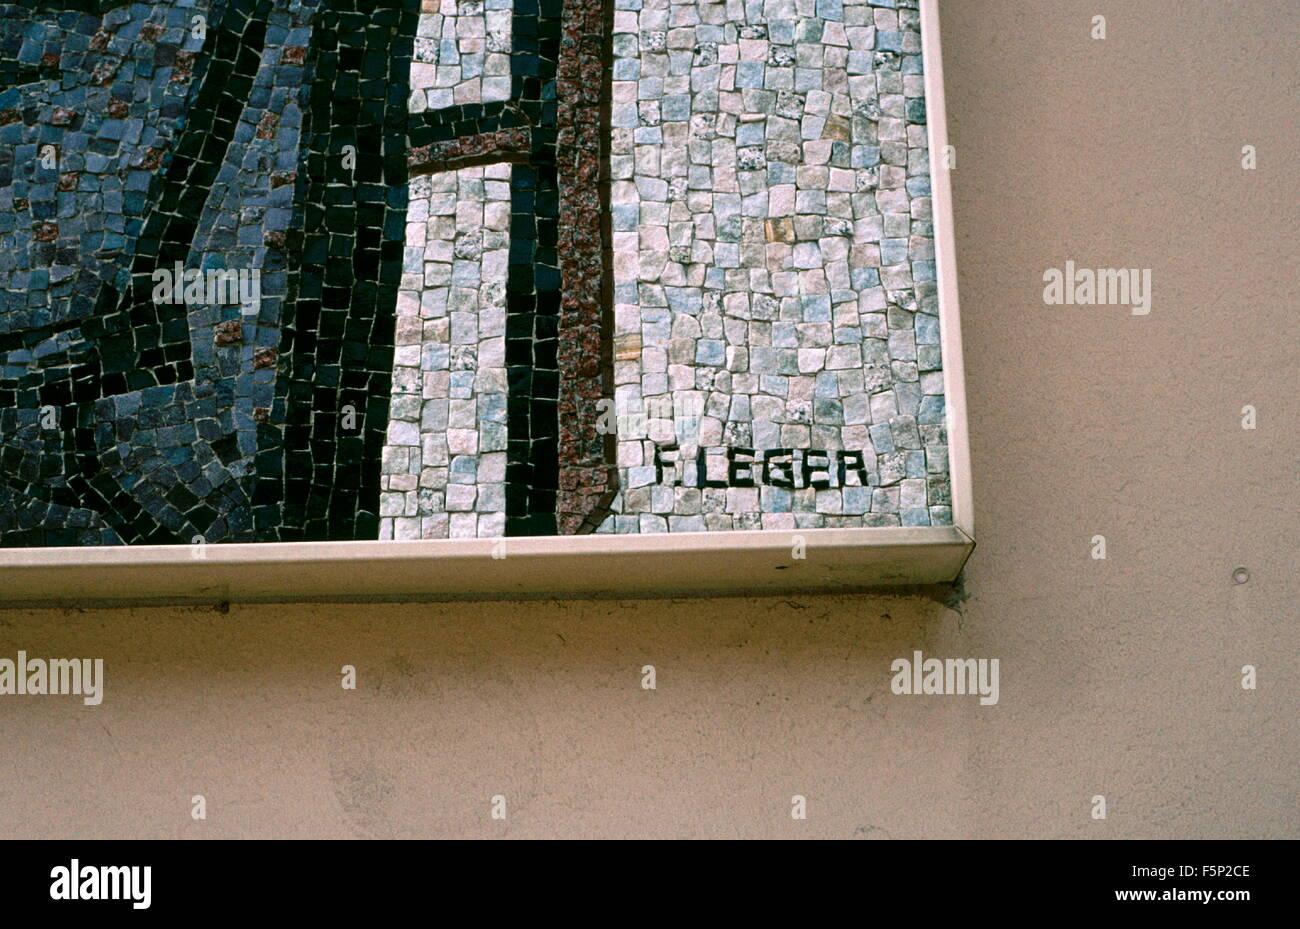 LEGER WALL ART - ARTISTu0027S SIGNATURE ON A MOSAIC PICTURE ENTITLED u0027LES TROIS MUSICIENSu0027 BY THE ARTIST FERNAND LEGER MOUNTED ON AN EXTERIOR WALL IN THE ... & AJAXNETPHOTO. 2002. MONTE CARLO MONACO. - LEGER WALL ART - ARTISTu0027S ...